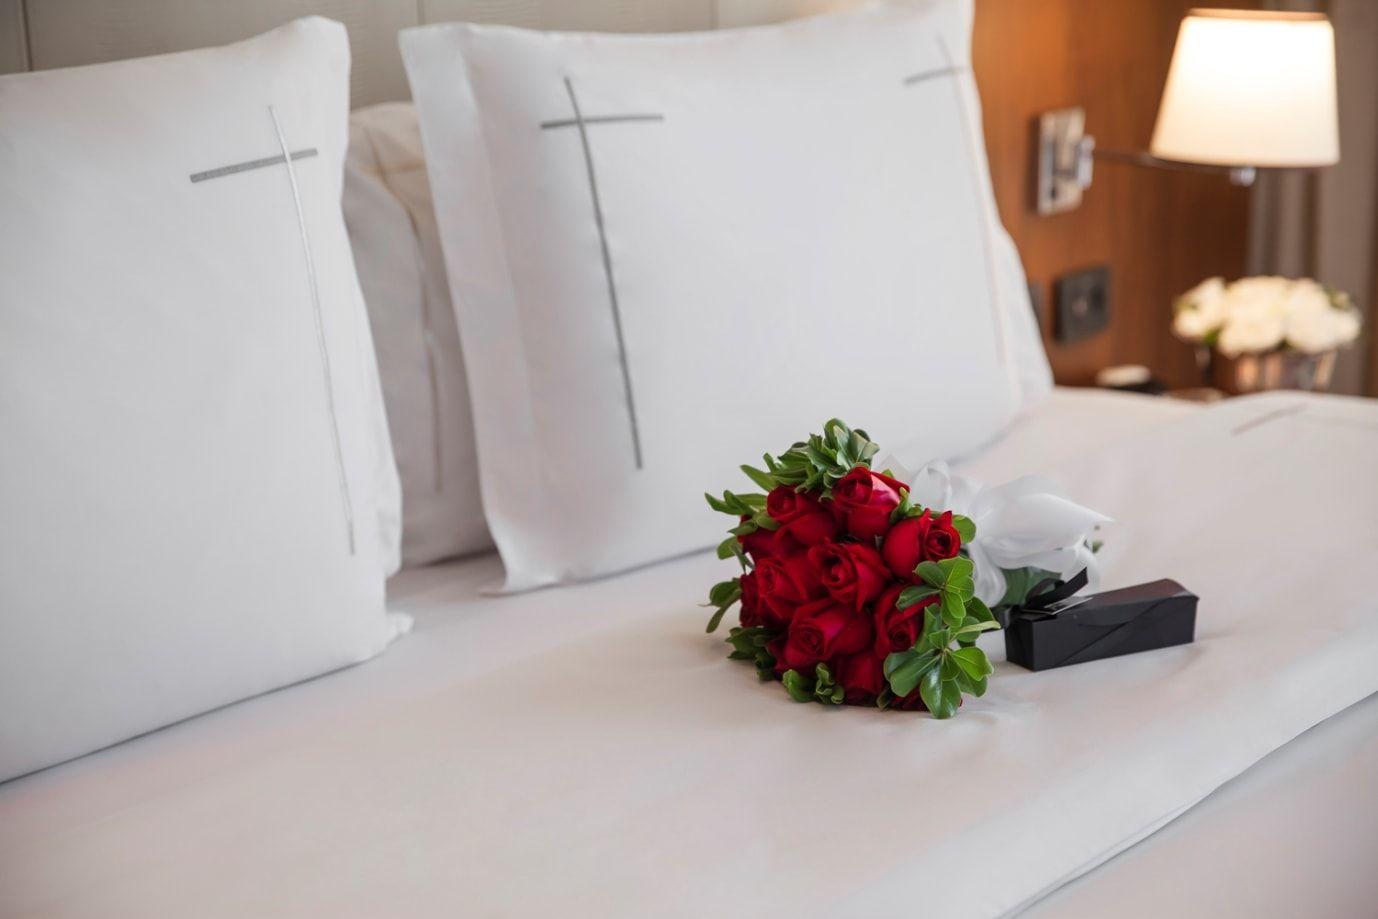 Romantic Experience 20% OFF | Tivoli Mofarrej SP Hotel